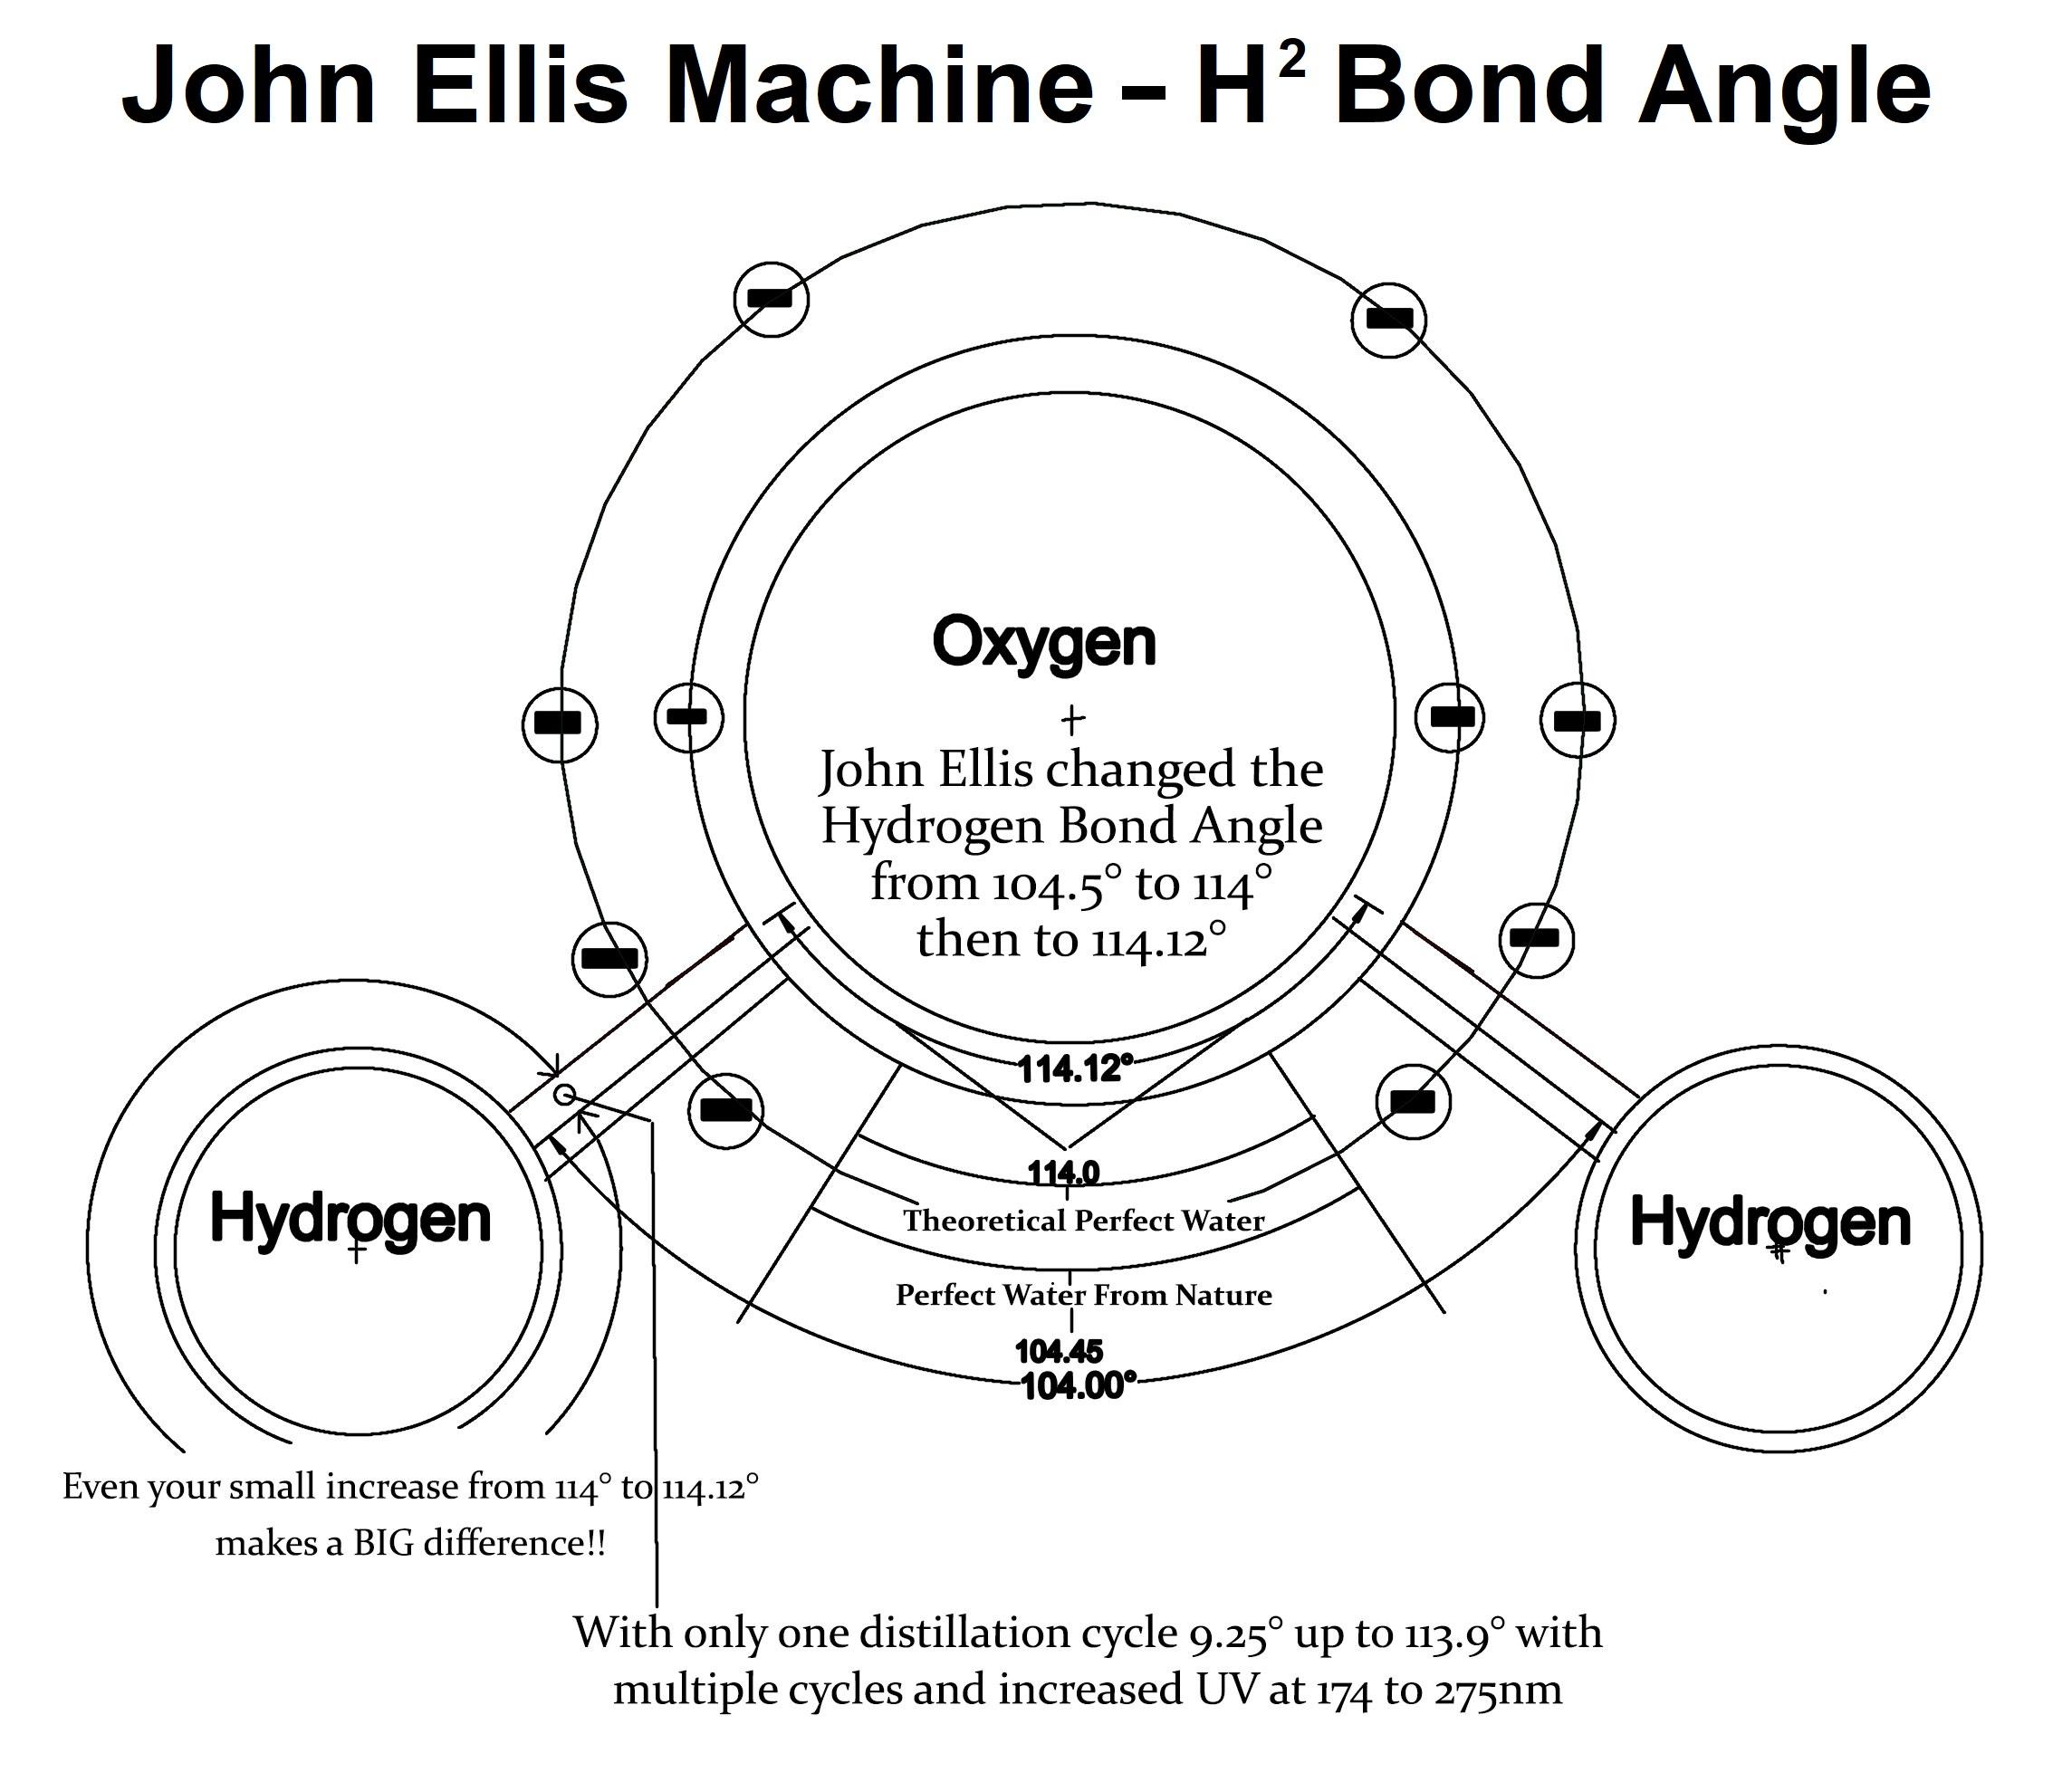 hyrdrogen-bond-angle-john-ellis-water.jpg